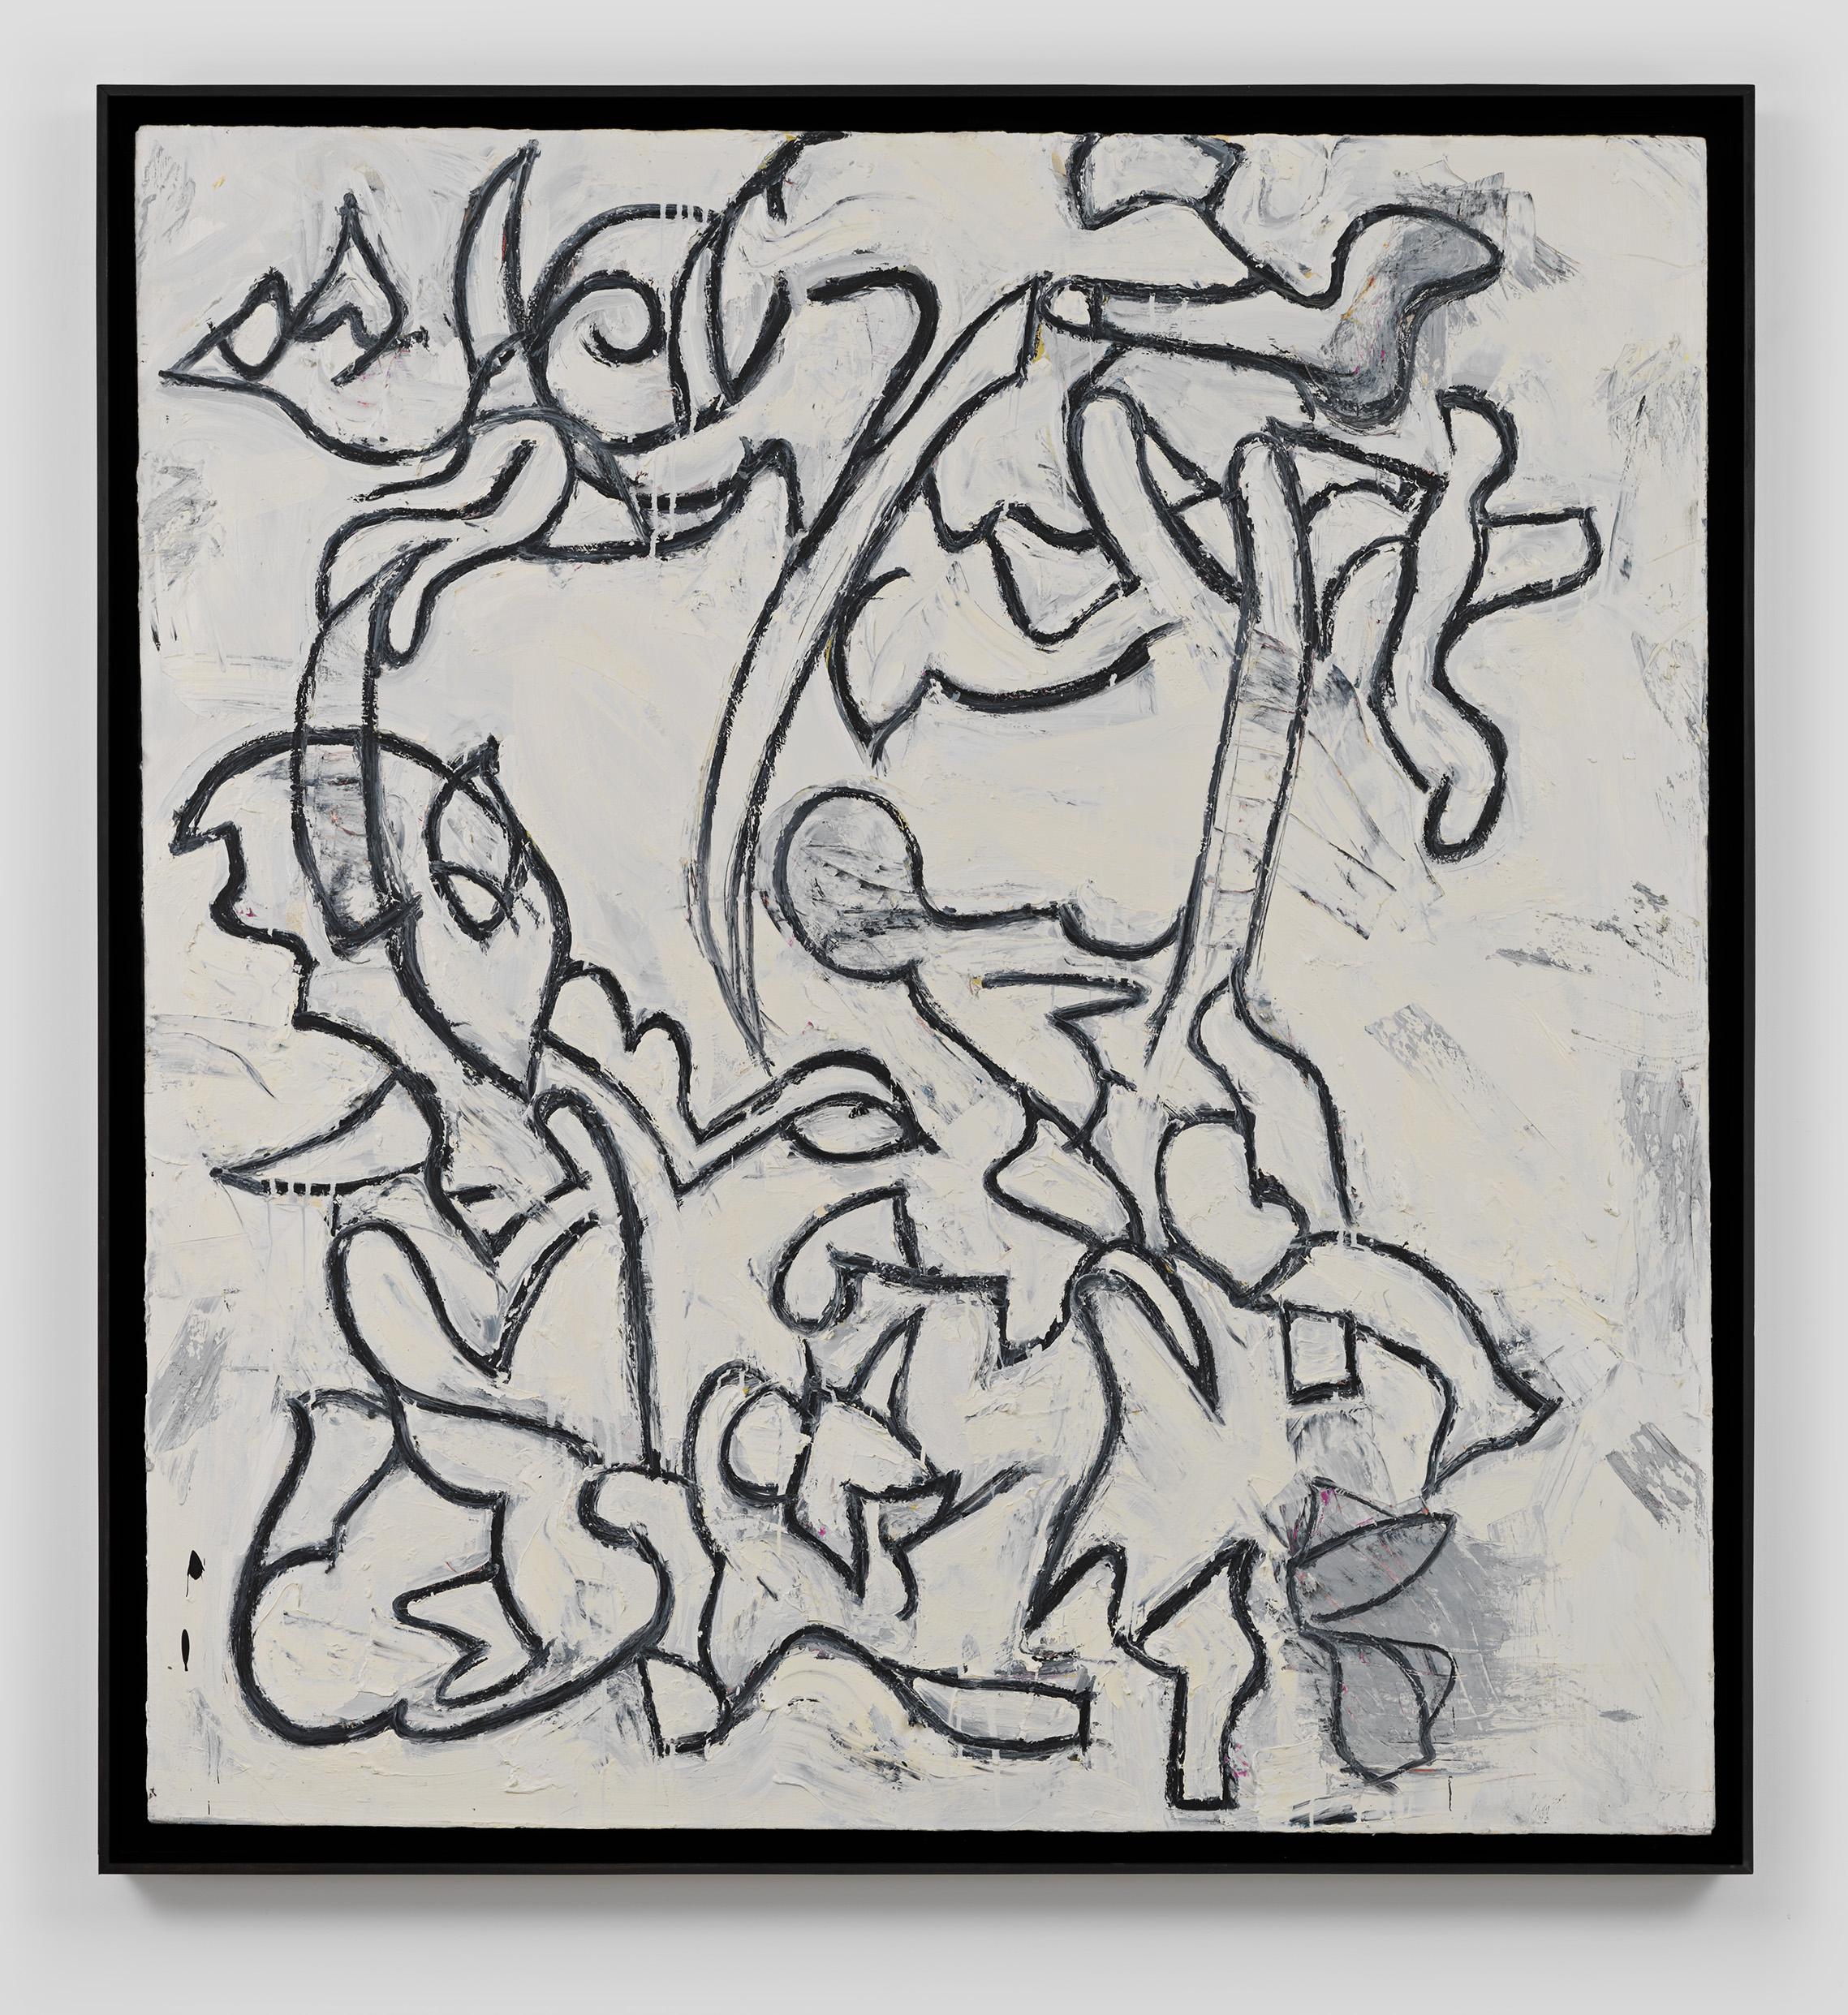 Memoir  2013 Oil on canvas 54 x 58 inches; Framed: 57 x 61 inches GW004